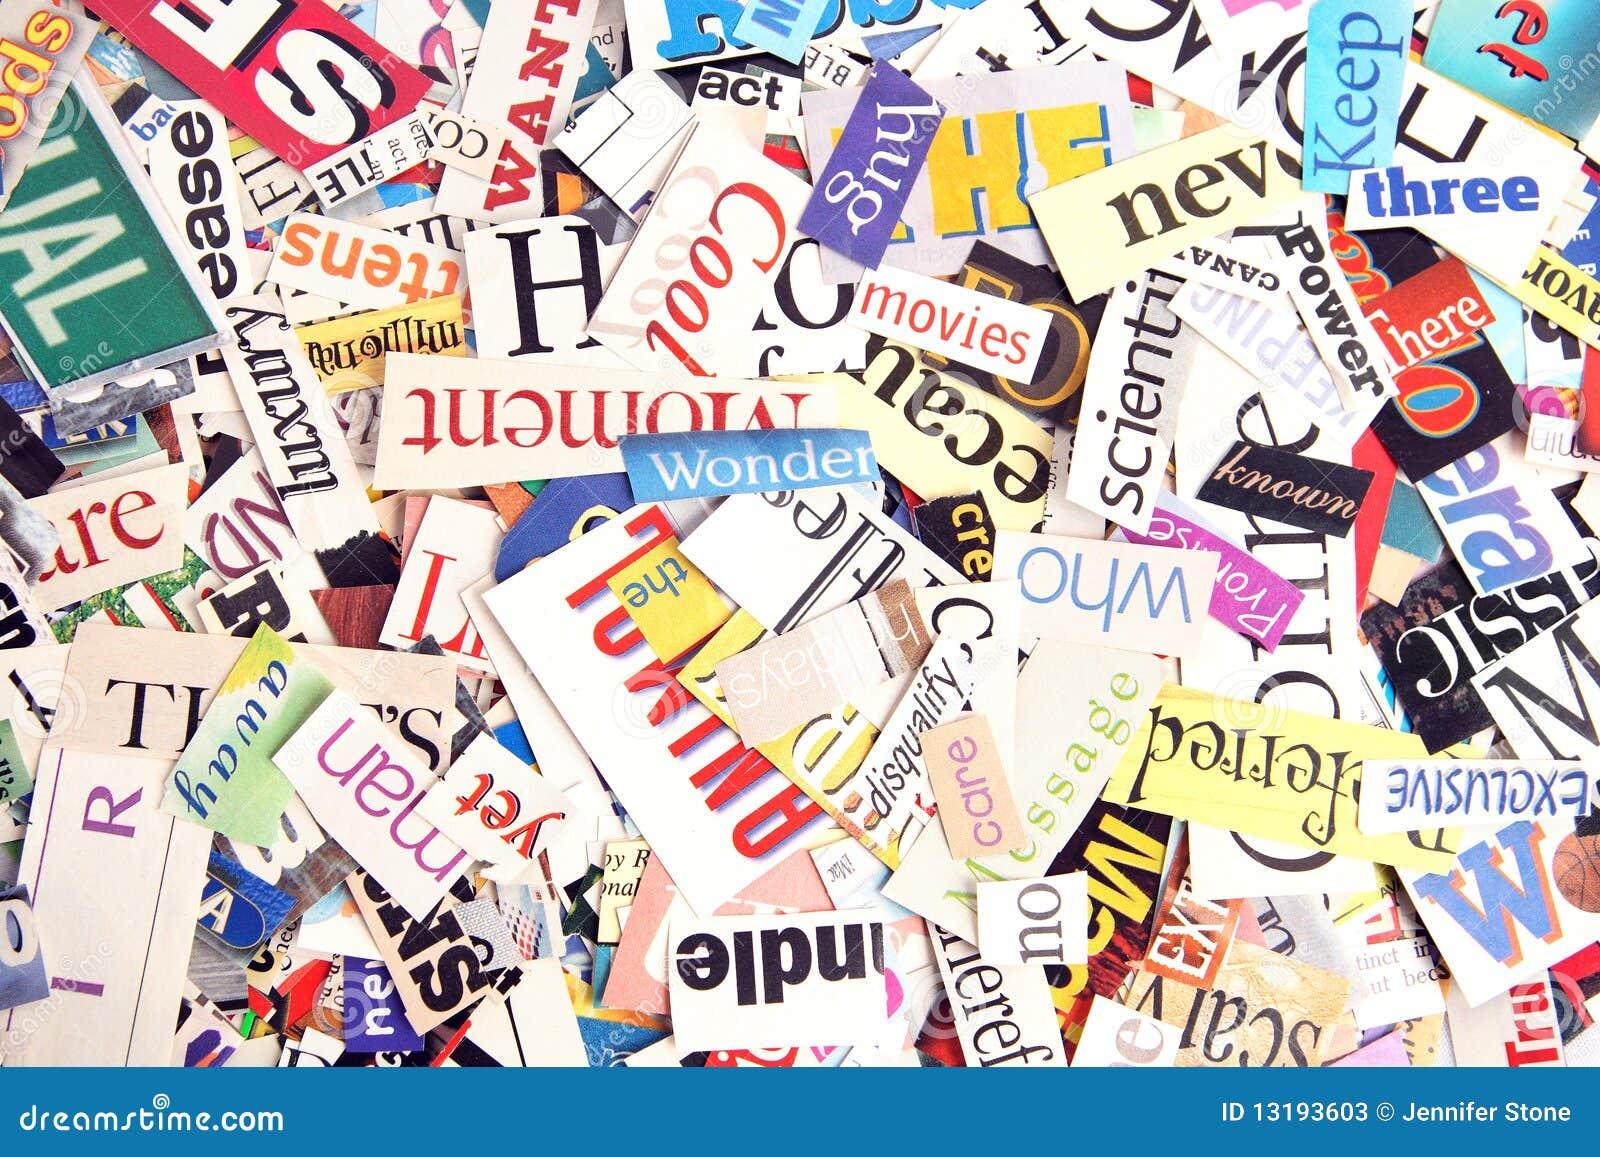 Magazine word background stock photography image 12291482 - Magazine Word Background Stock Photography Image 12291482 Magazine Word Background Stock Photography Image 12291482 Royalty